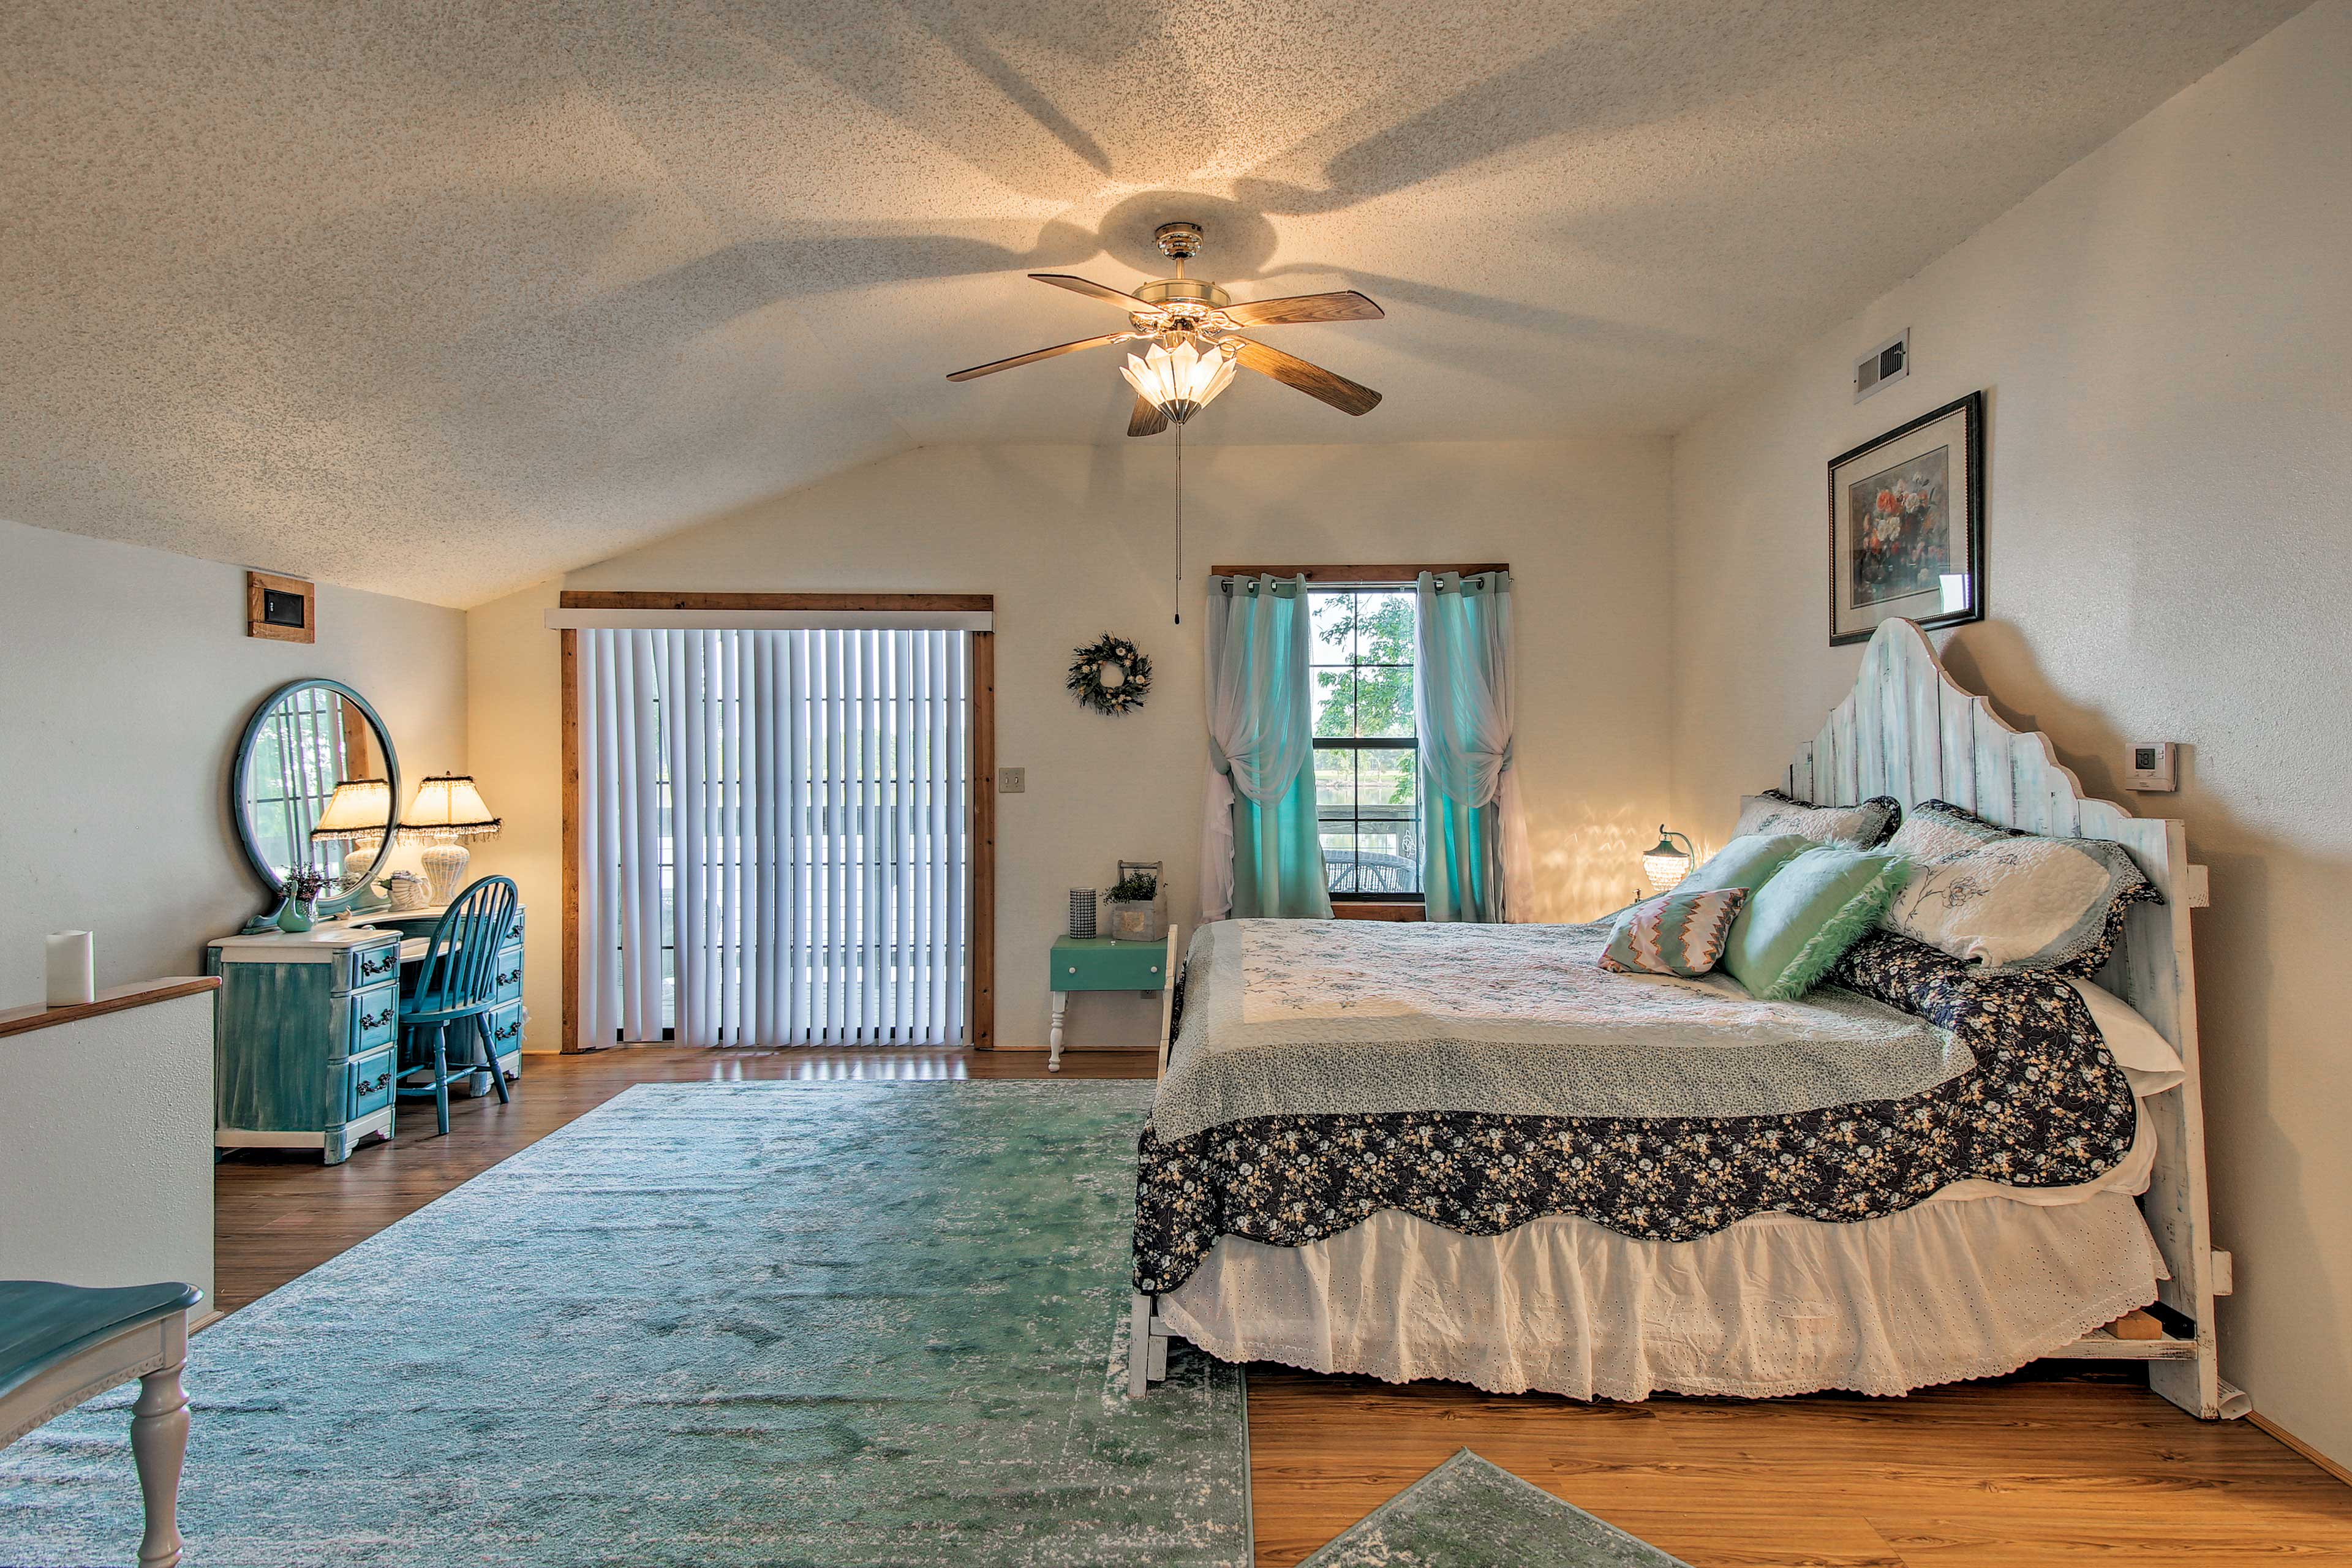 Sleep peacefully in this large upstairs bedroom.